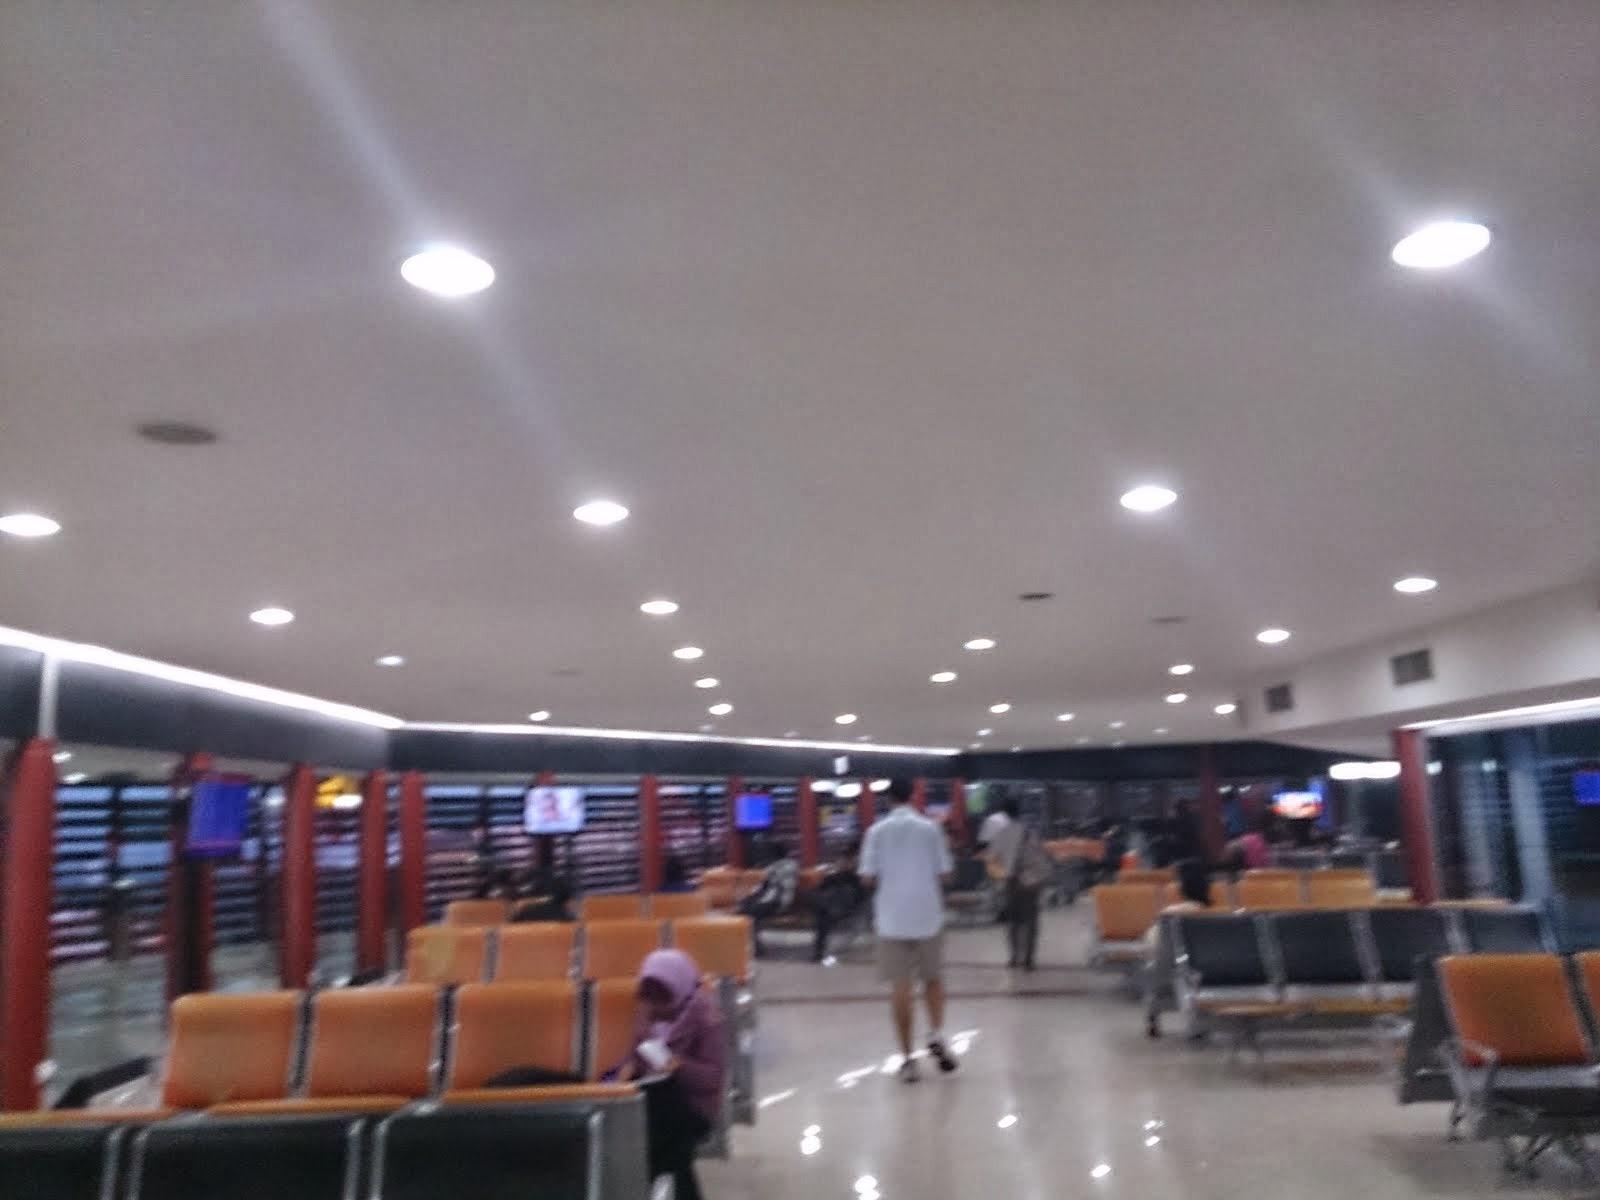 R.Tunggu Terminal 1 B Bandara Soekarno Hatta